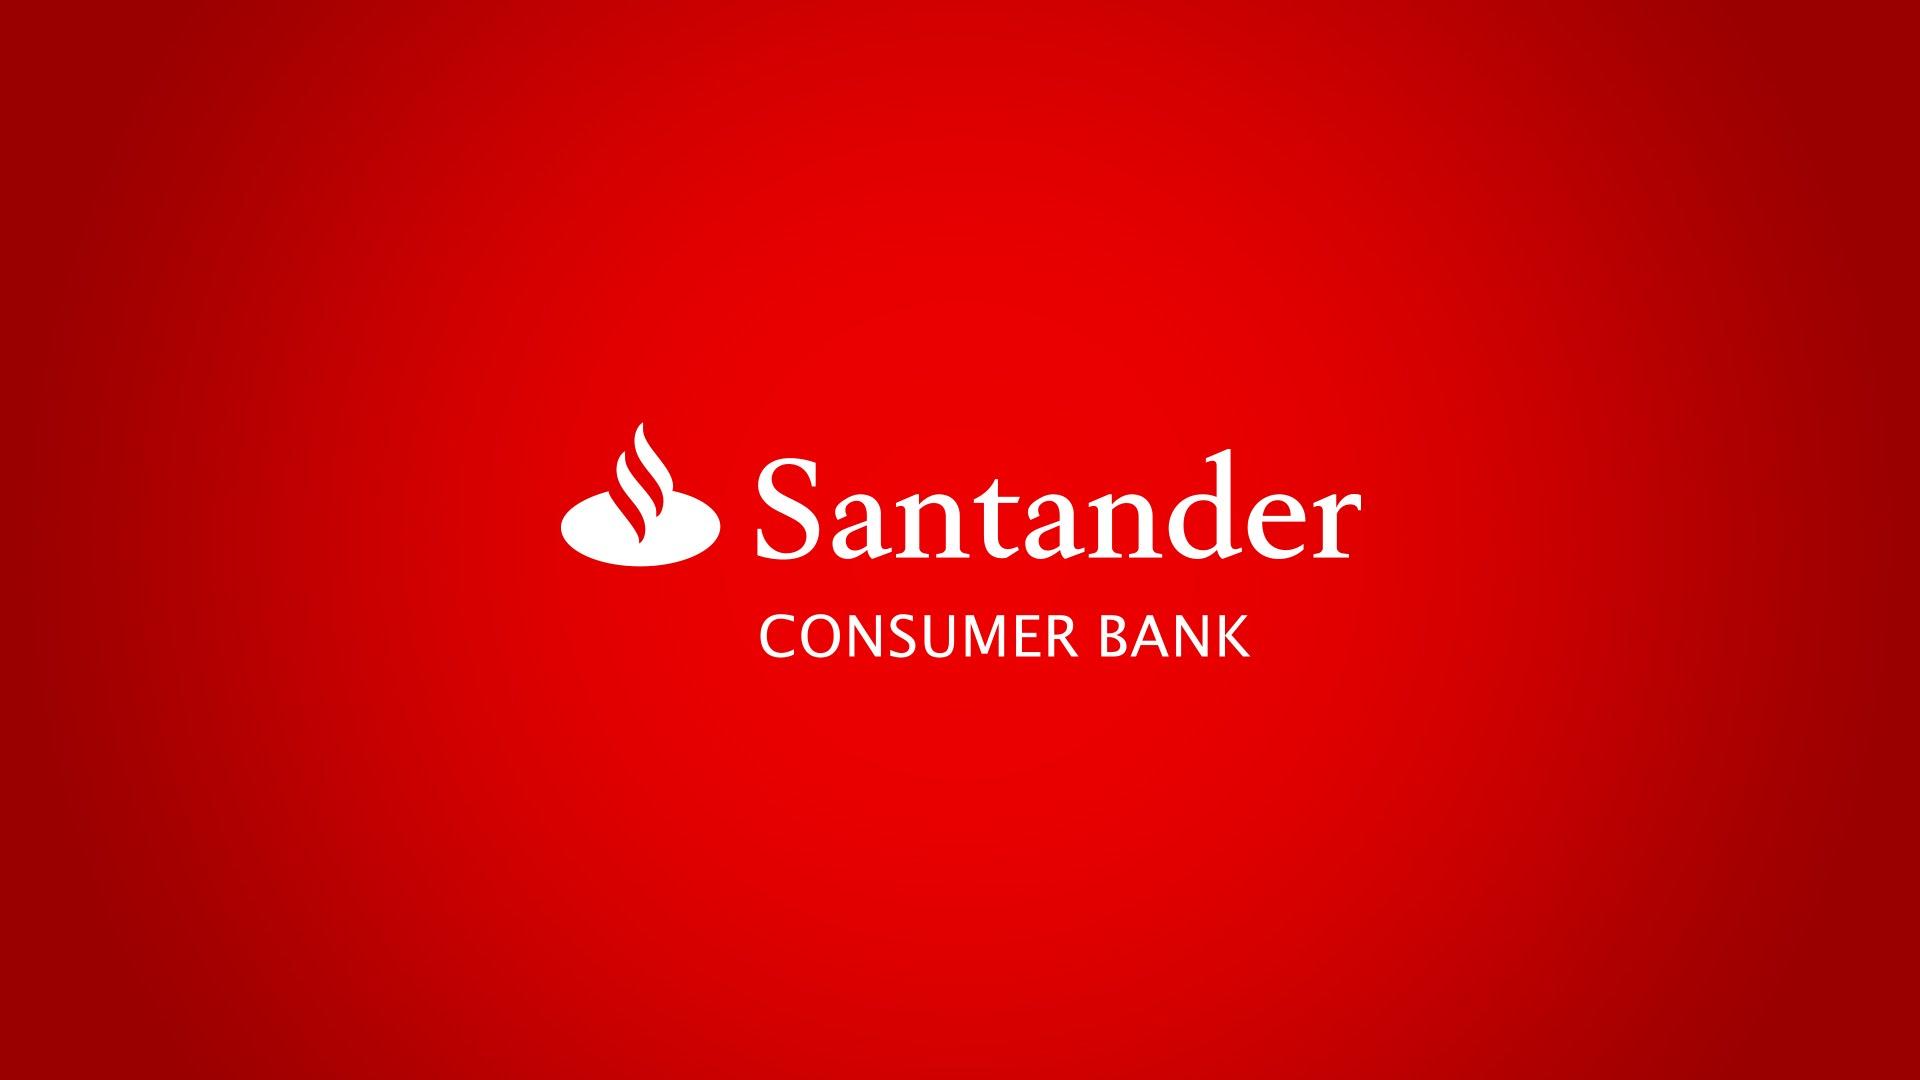 Best 39 Santander Bank Wallpaper on HipWallpaper Santander Bank 1920x1080